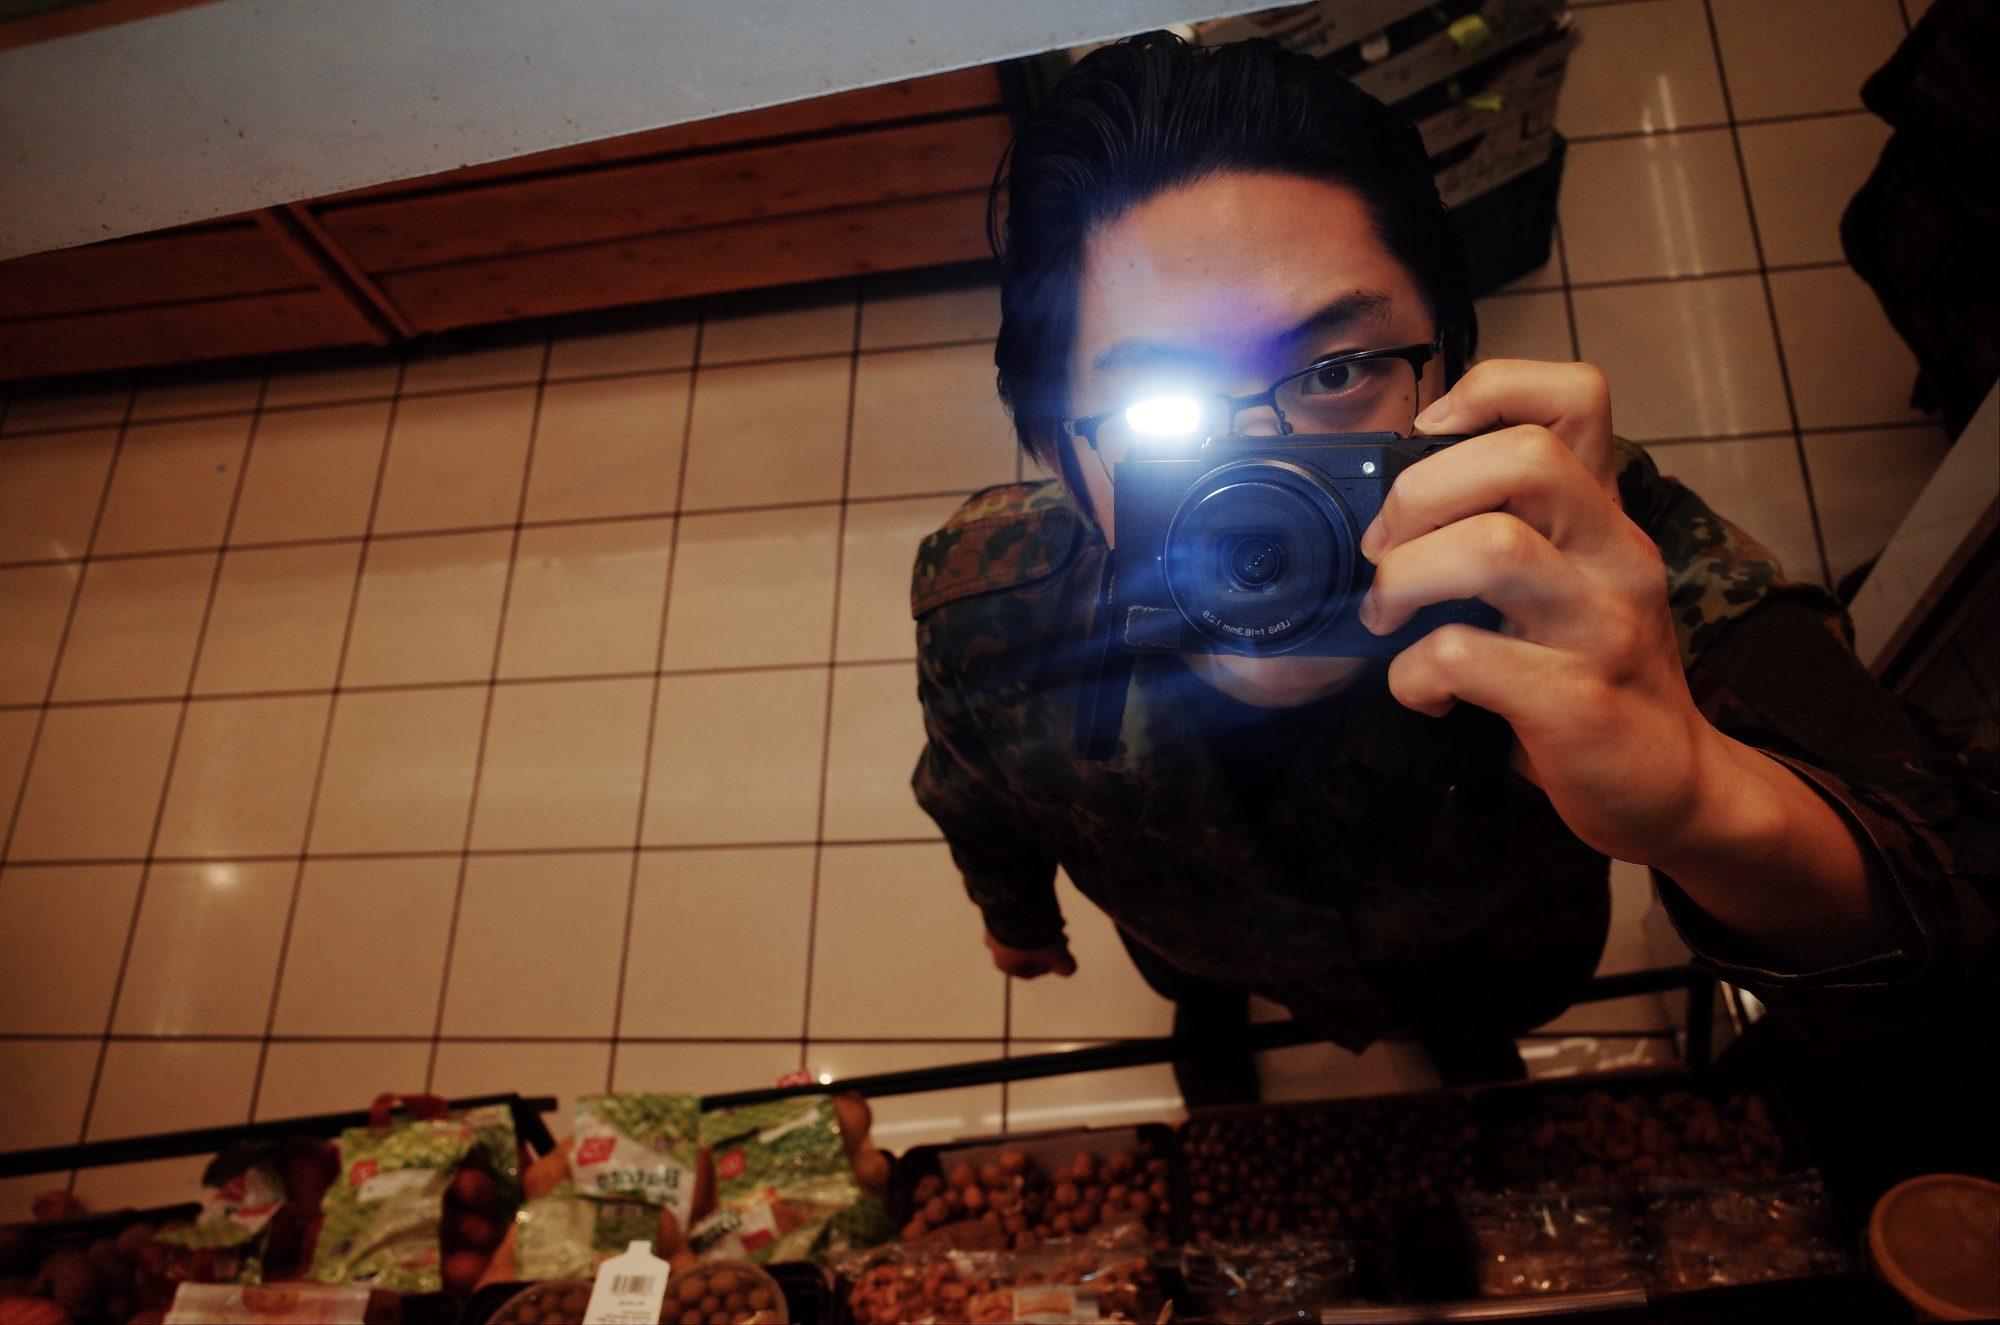 Lisbon selfie